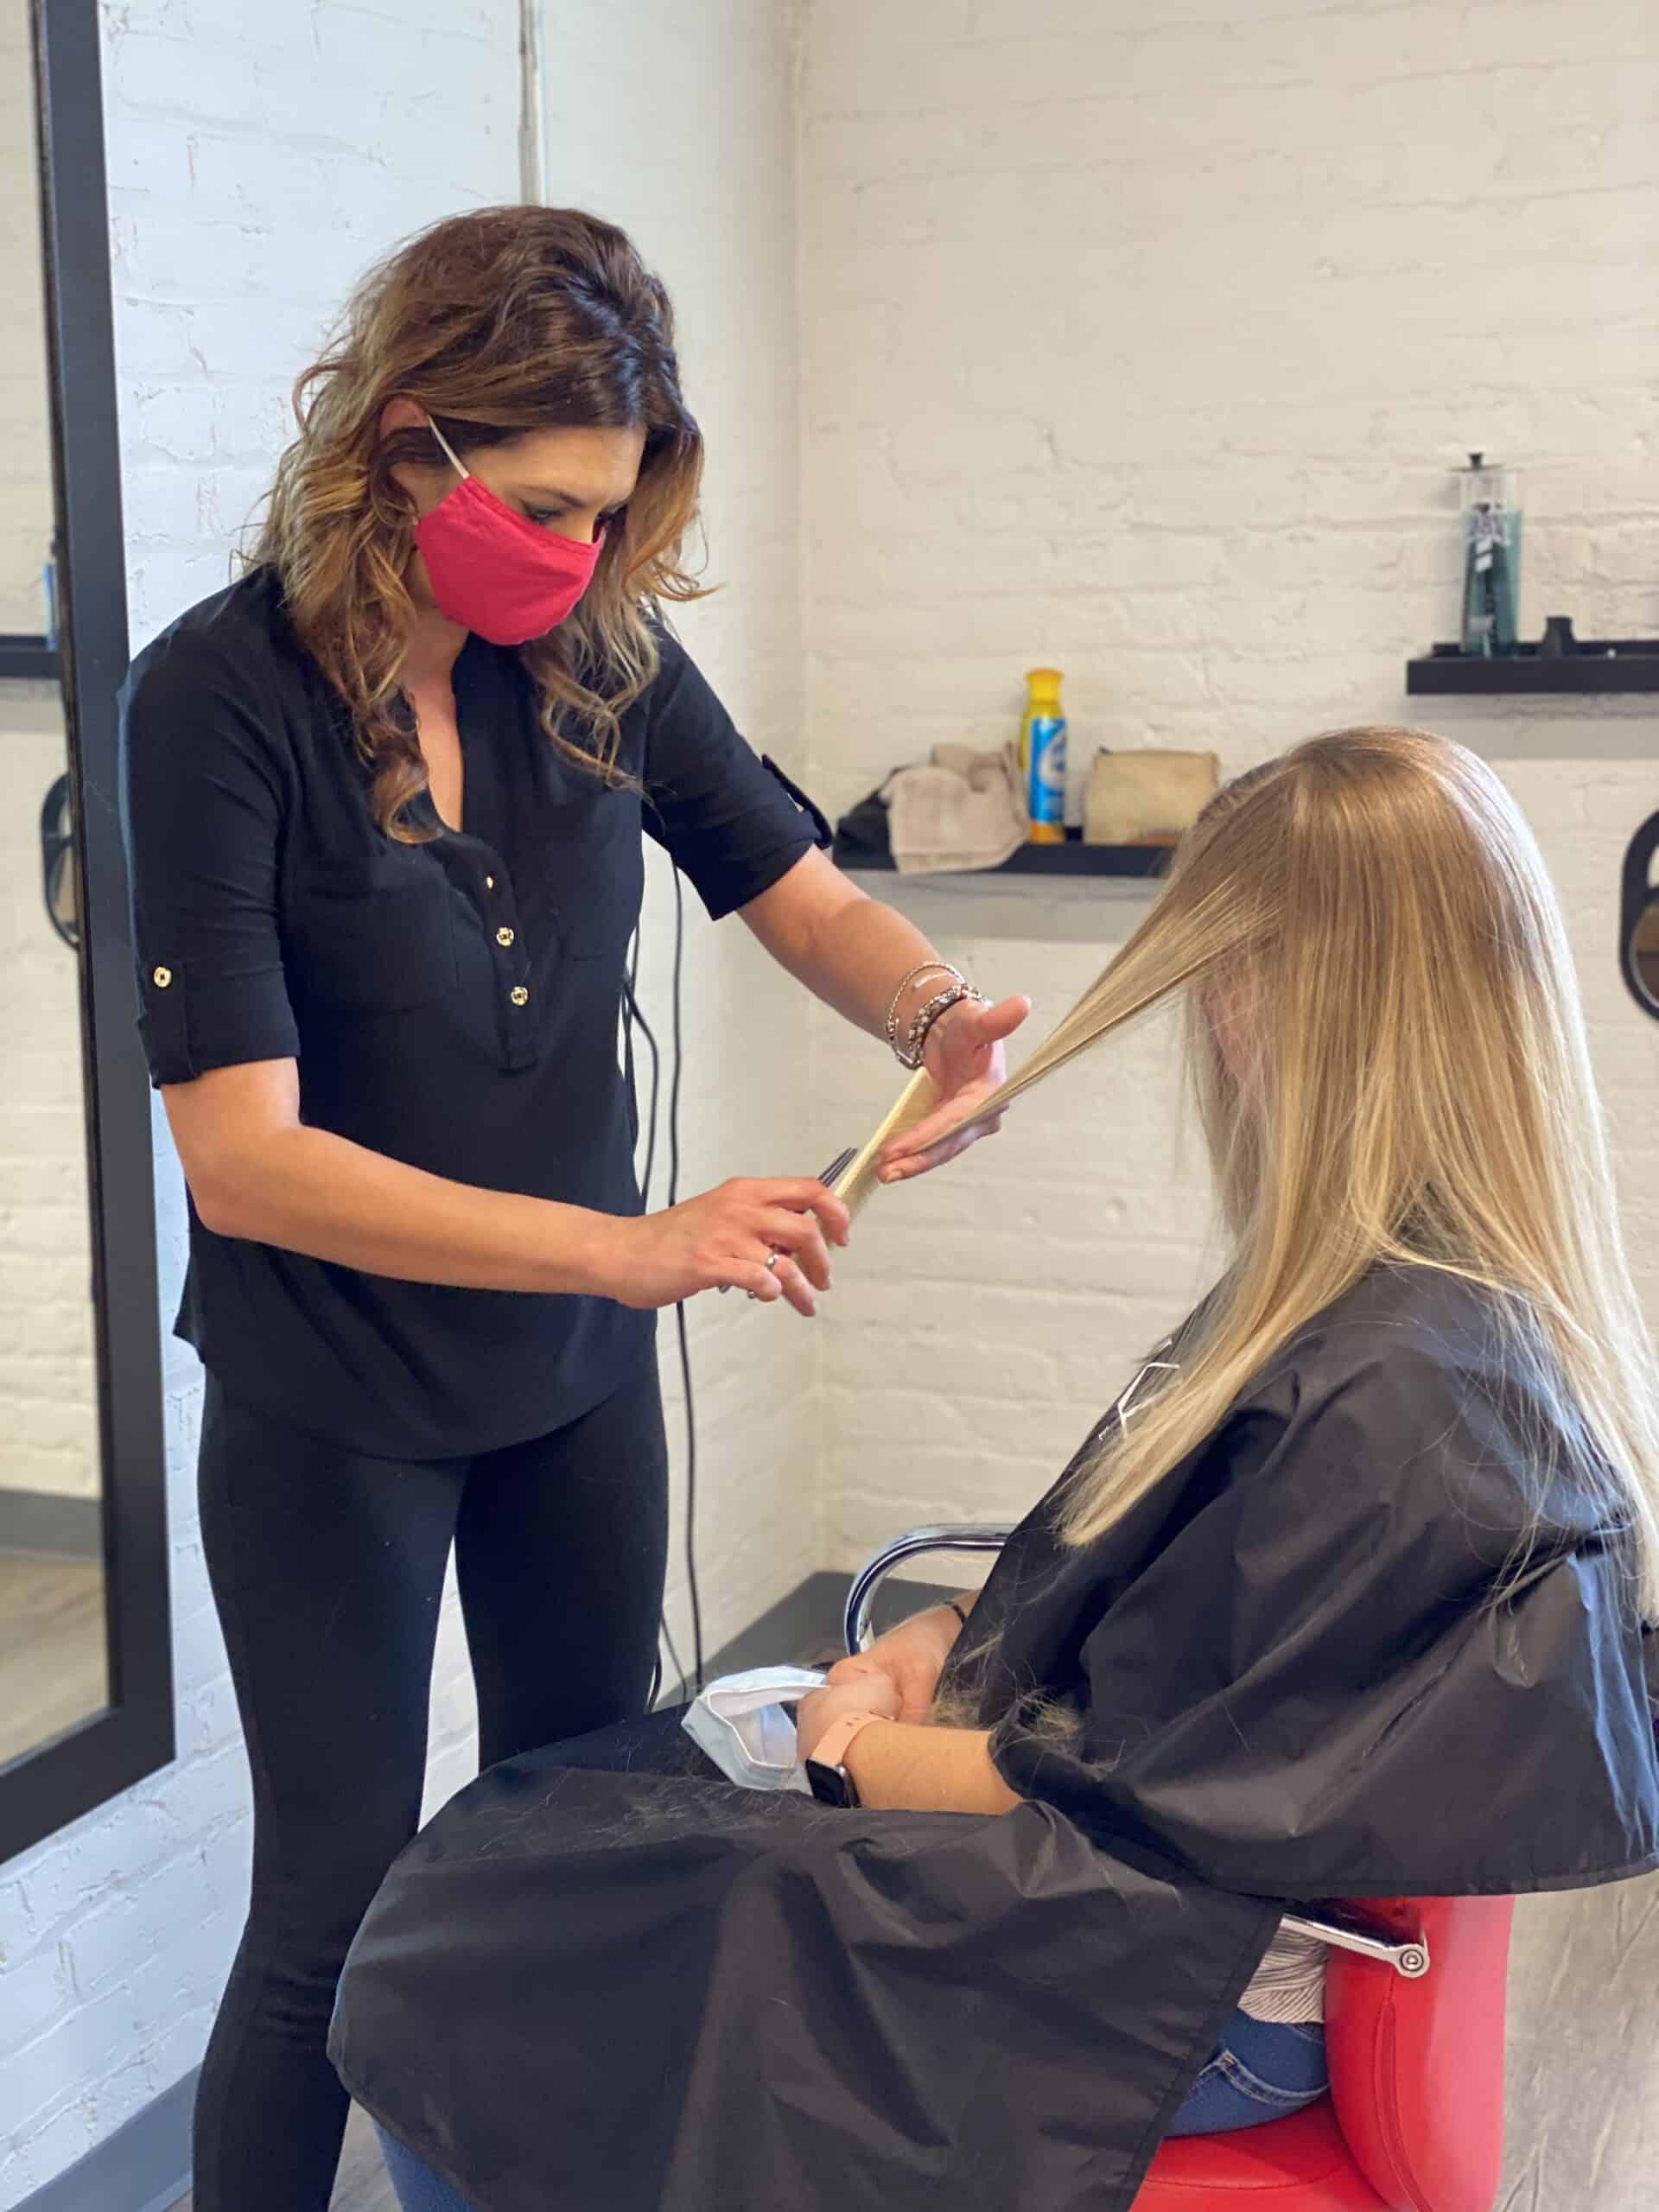 how long should you go between haircuts